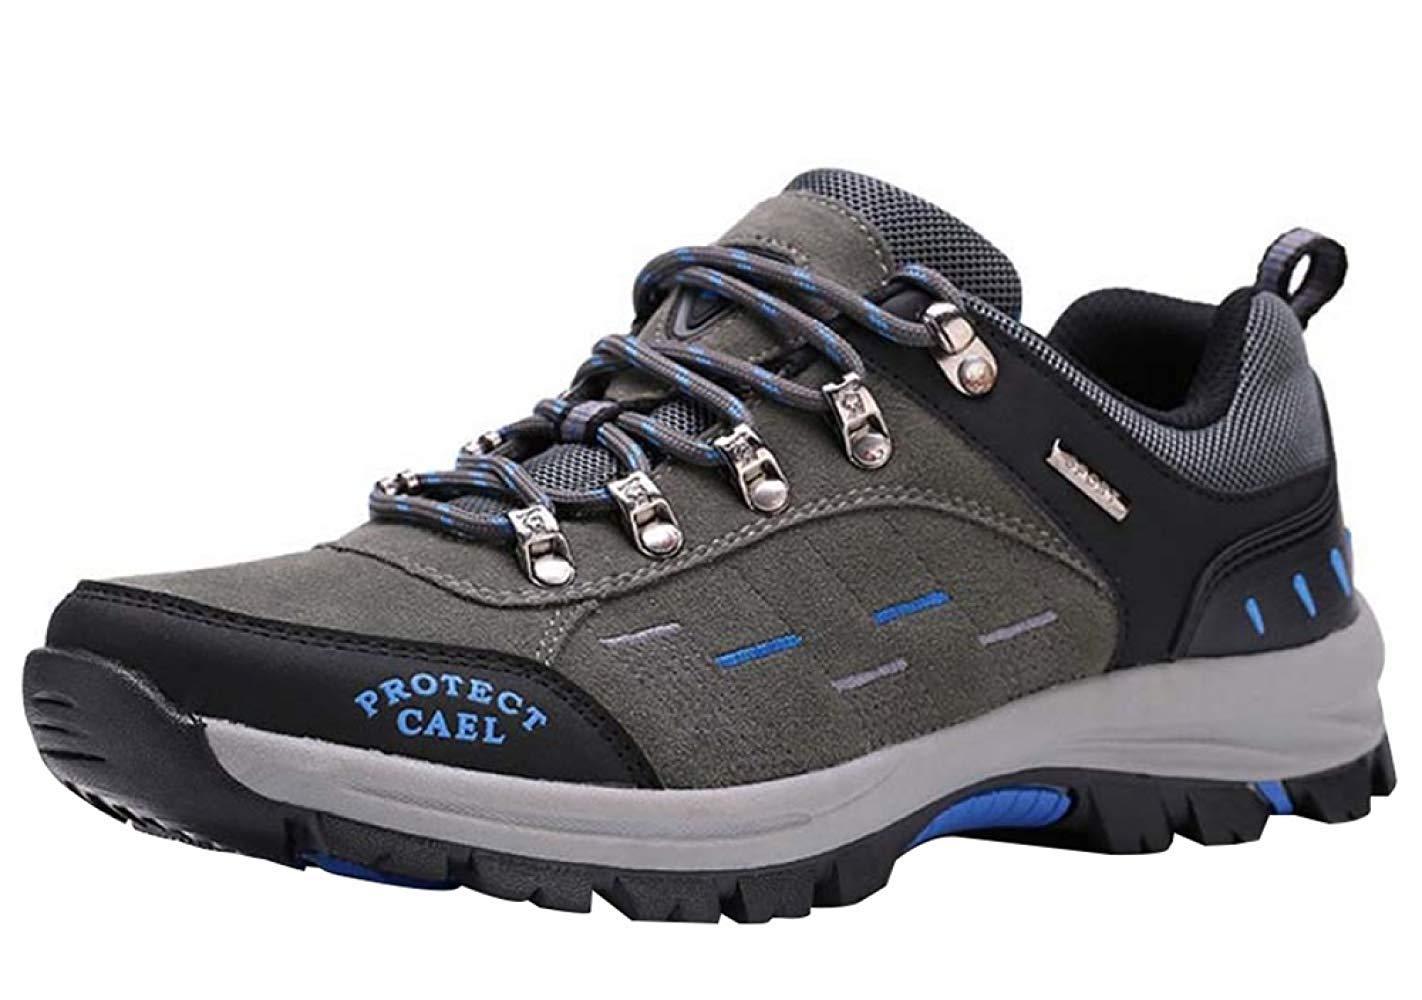 HhGold Männer Wanderschuhe Stiefel Leder Wanderschuhe Turnschuhe Für Outdoor Trekking Training Beiläufige Arbeit (Farbe : 11, Größe : 41EU)